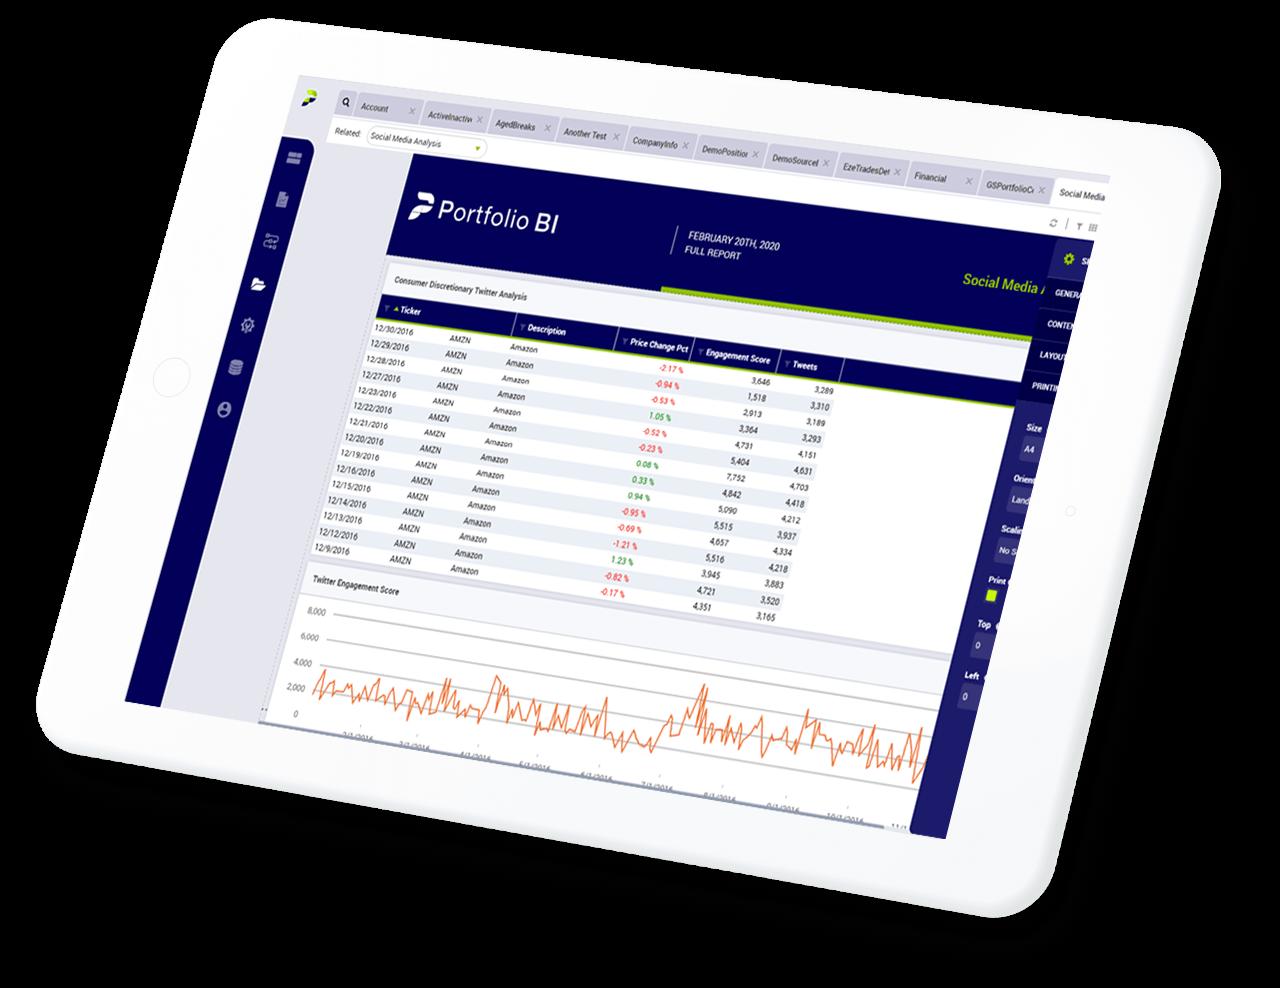 Portfolio BI analyst report on a tablet.